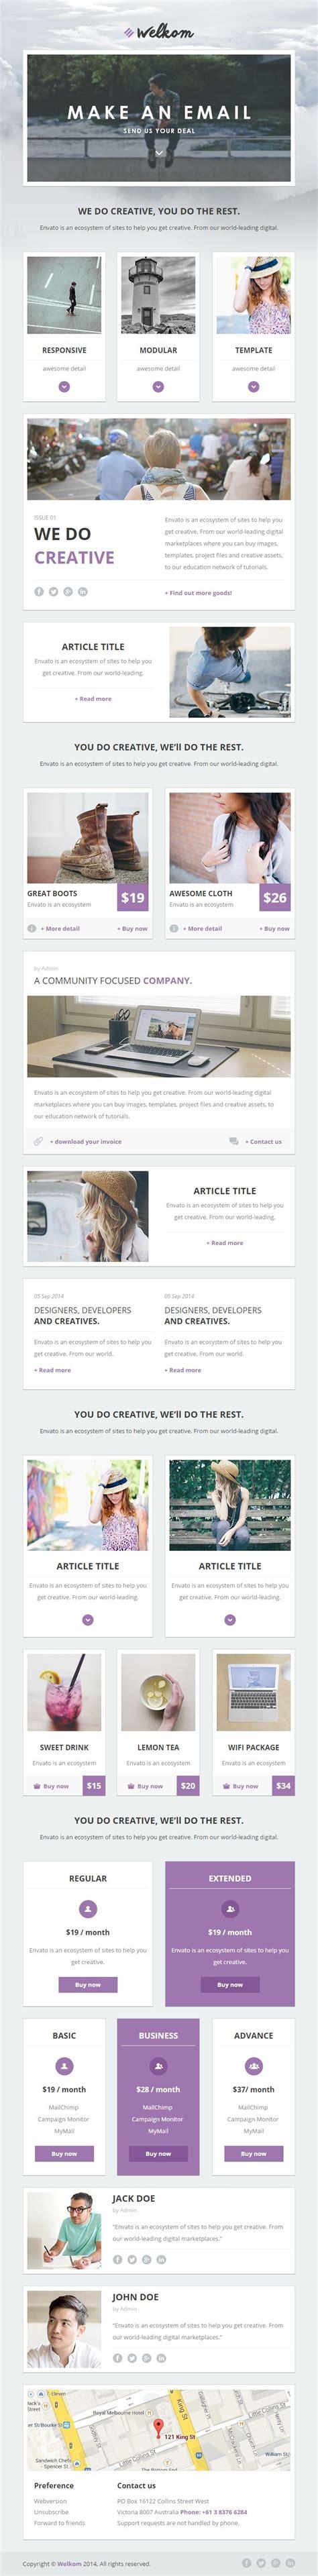 mymail newsletter templates best 25 newsletter design ideas on newsletter